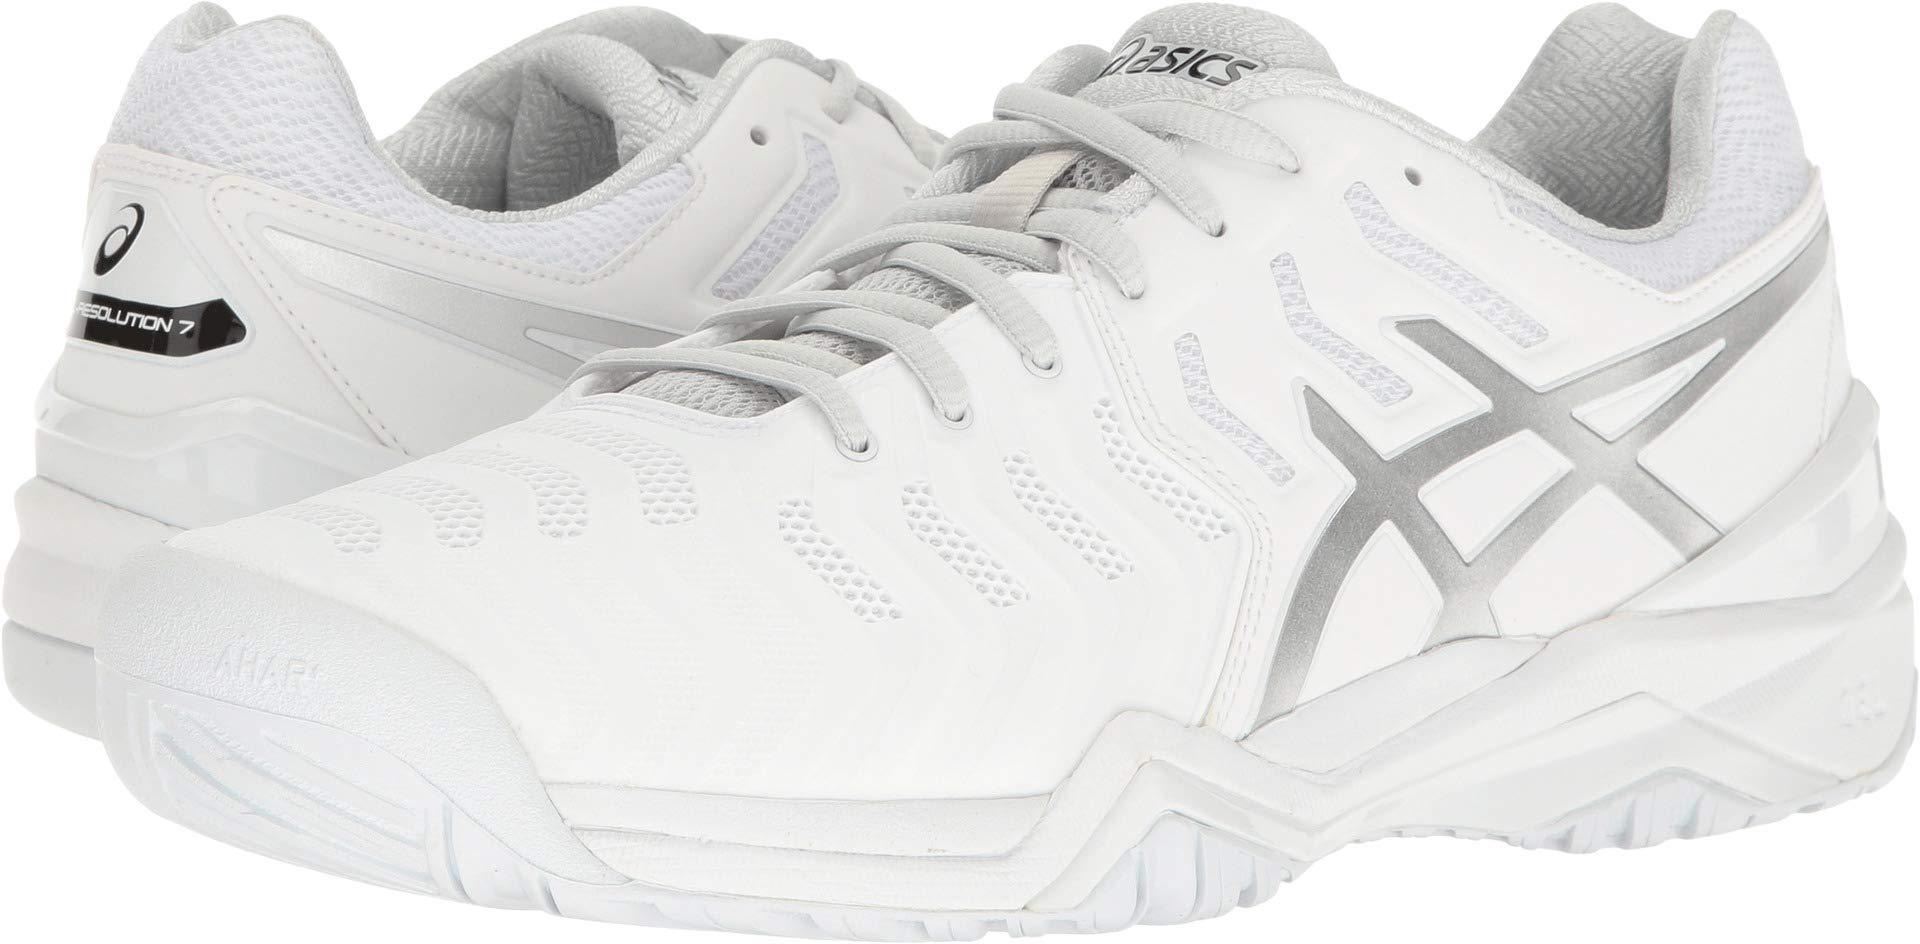 ASICS Men's Gel-Resolution 7 Tennis Shoe, White/Silver, 11 M US by ASICS